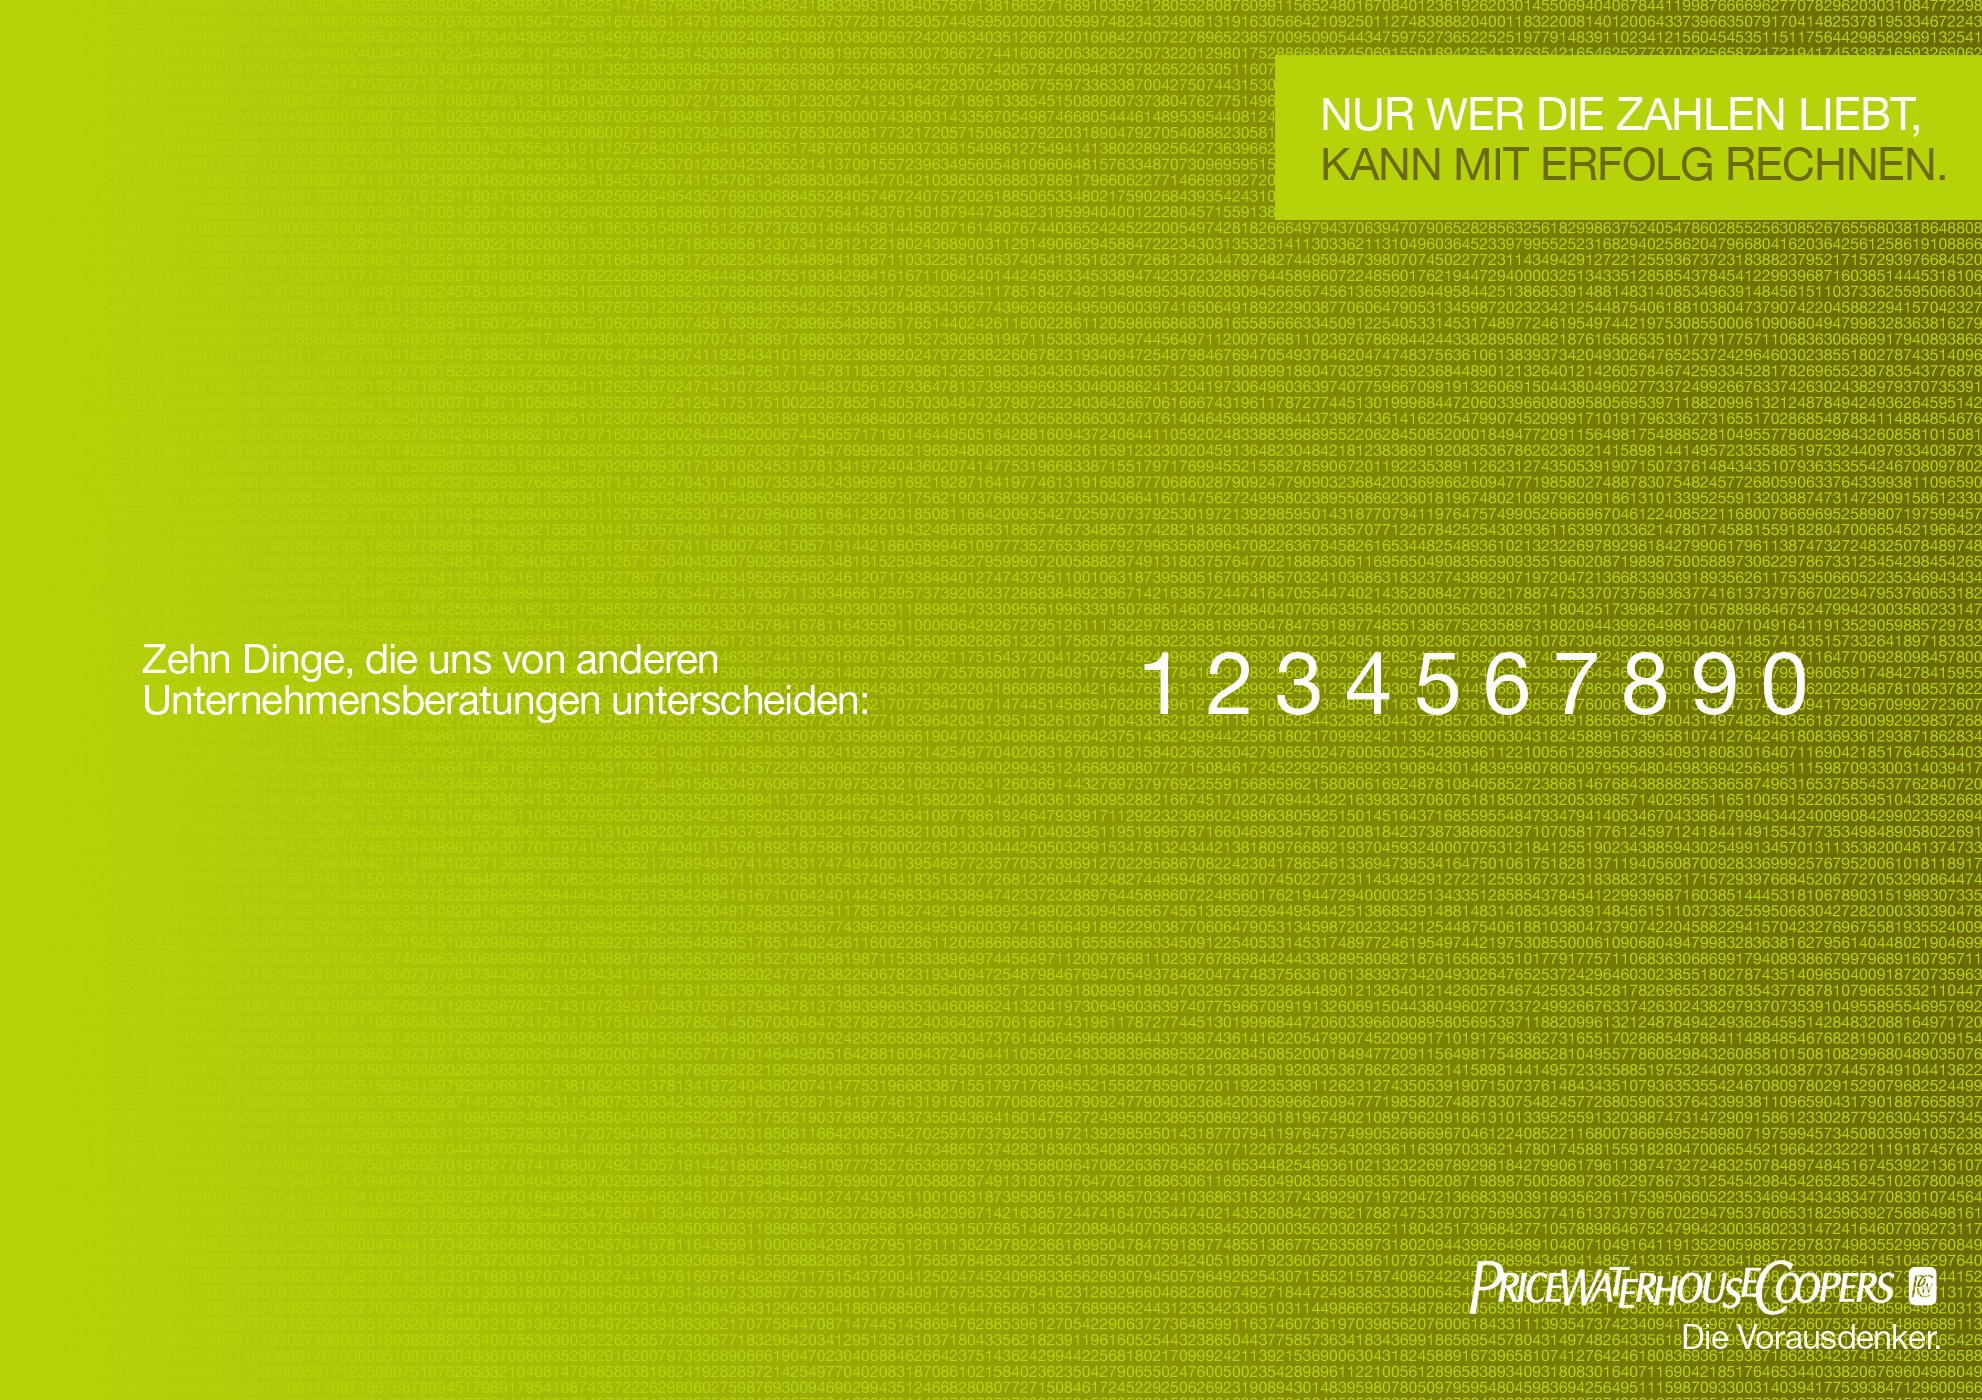 PwC_Zahlen_JPG_02.6